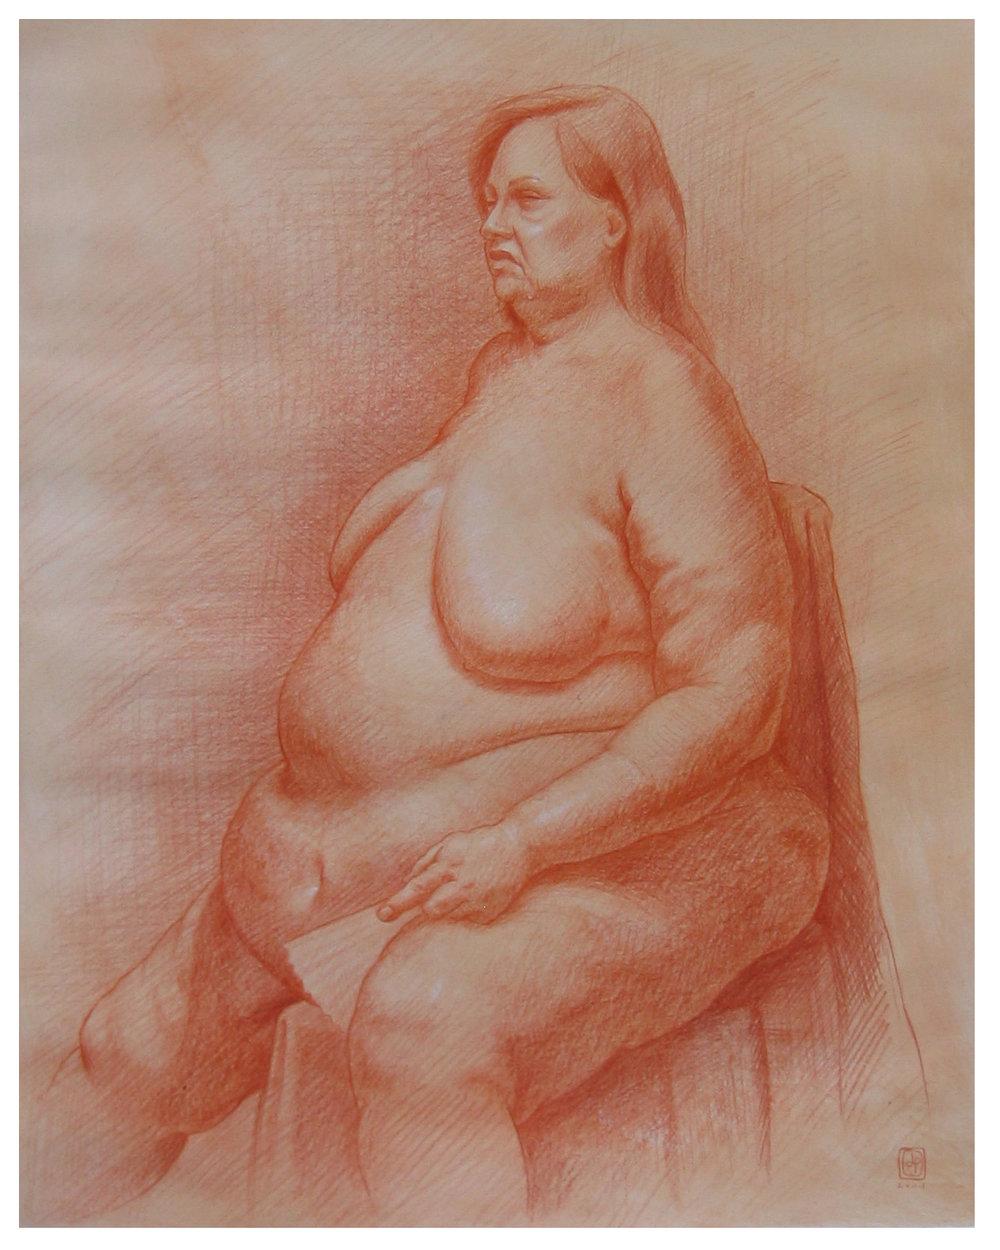 drawing (Eviva).jpg